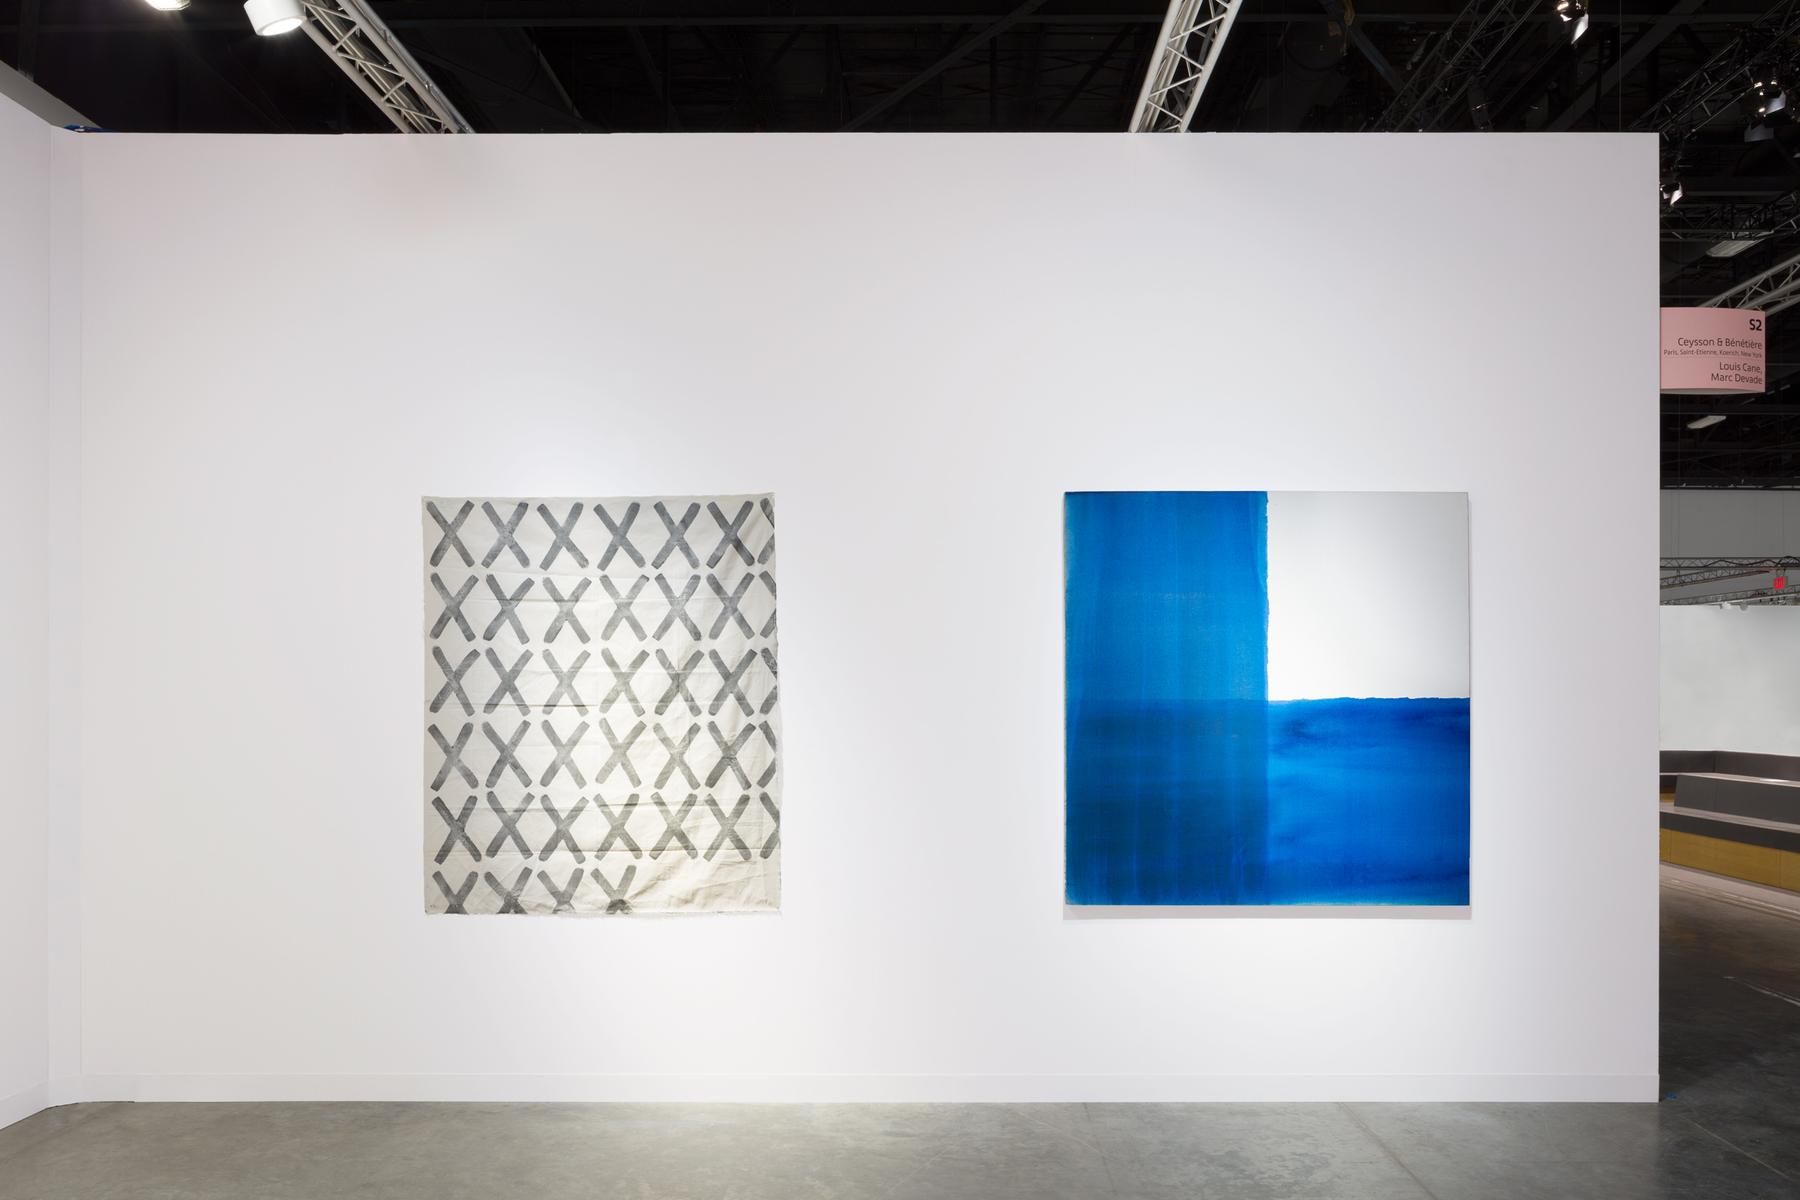 2_Art Basel Miami Beac 2018 70